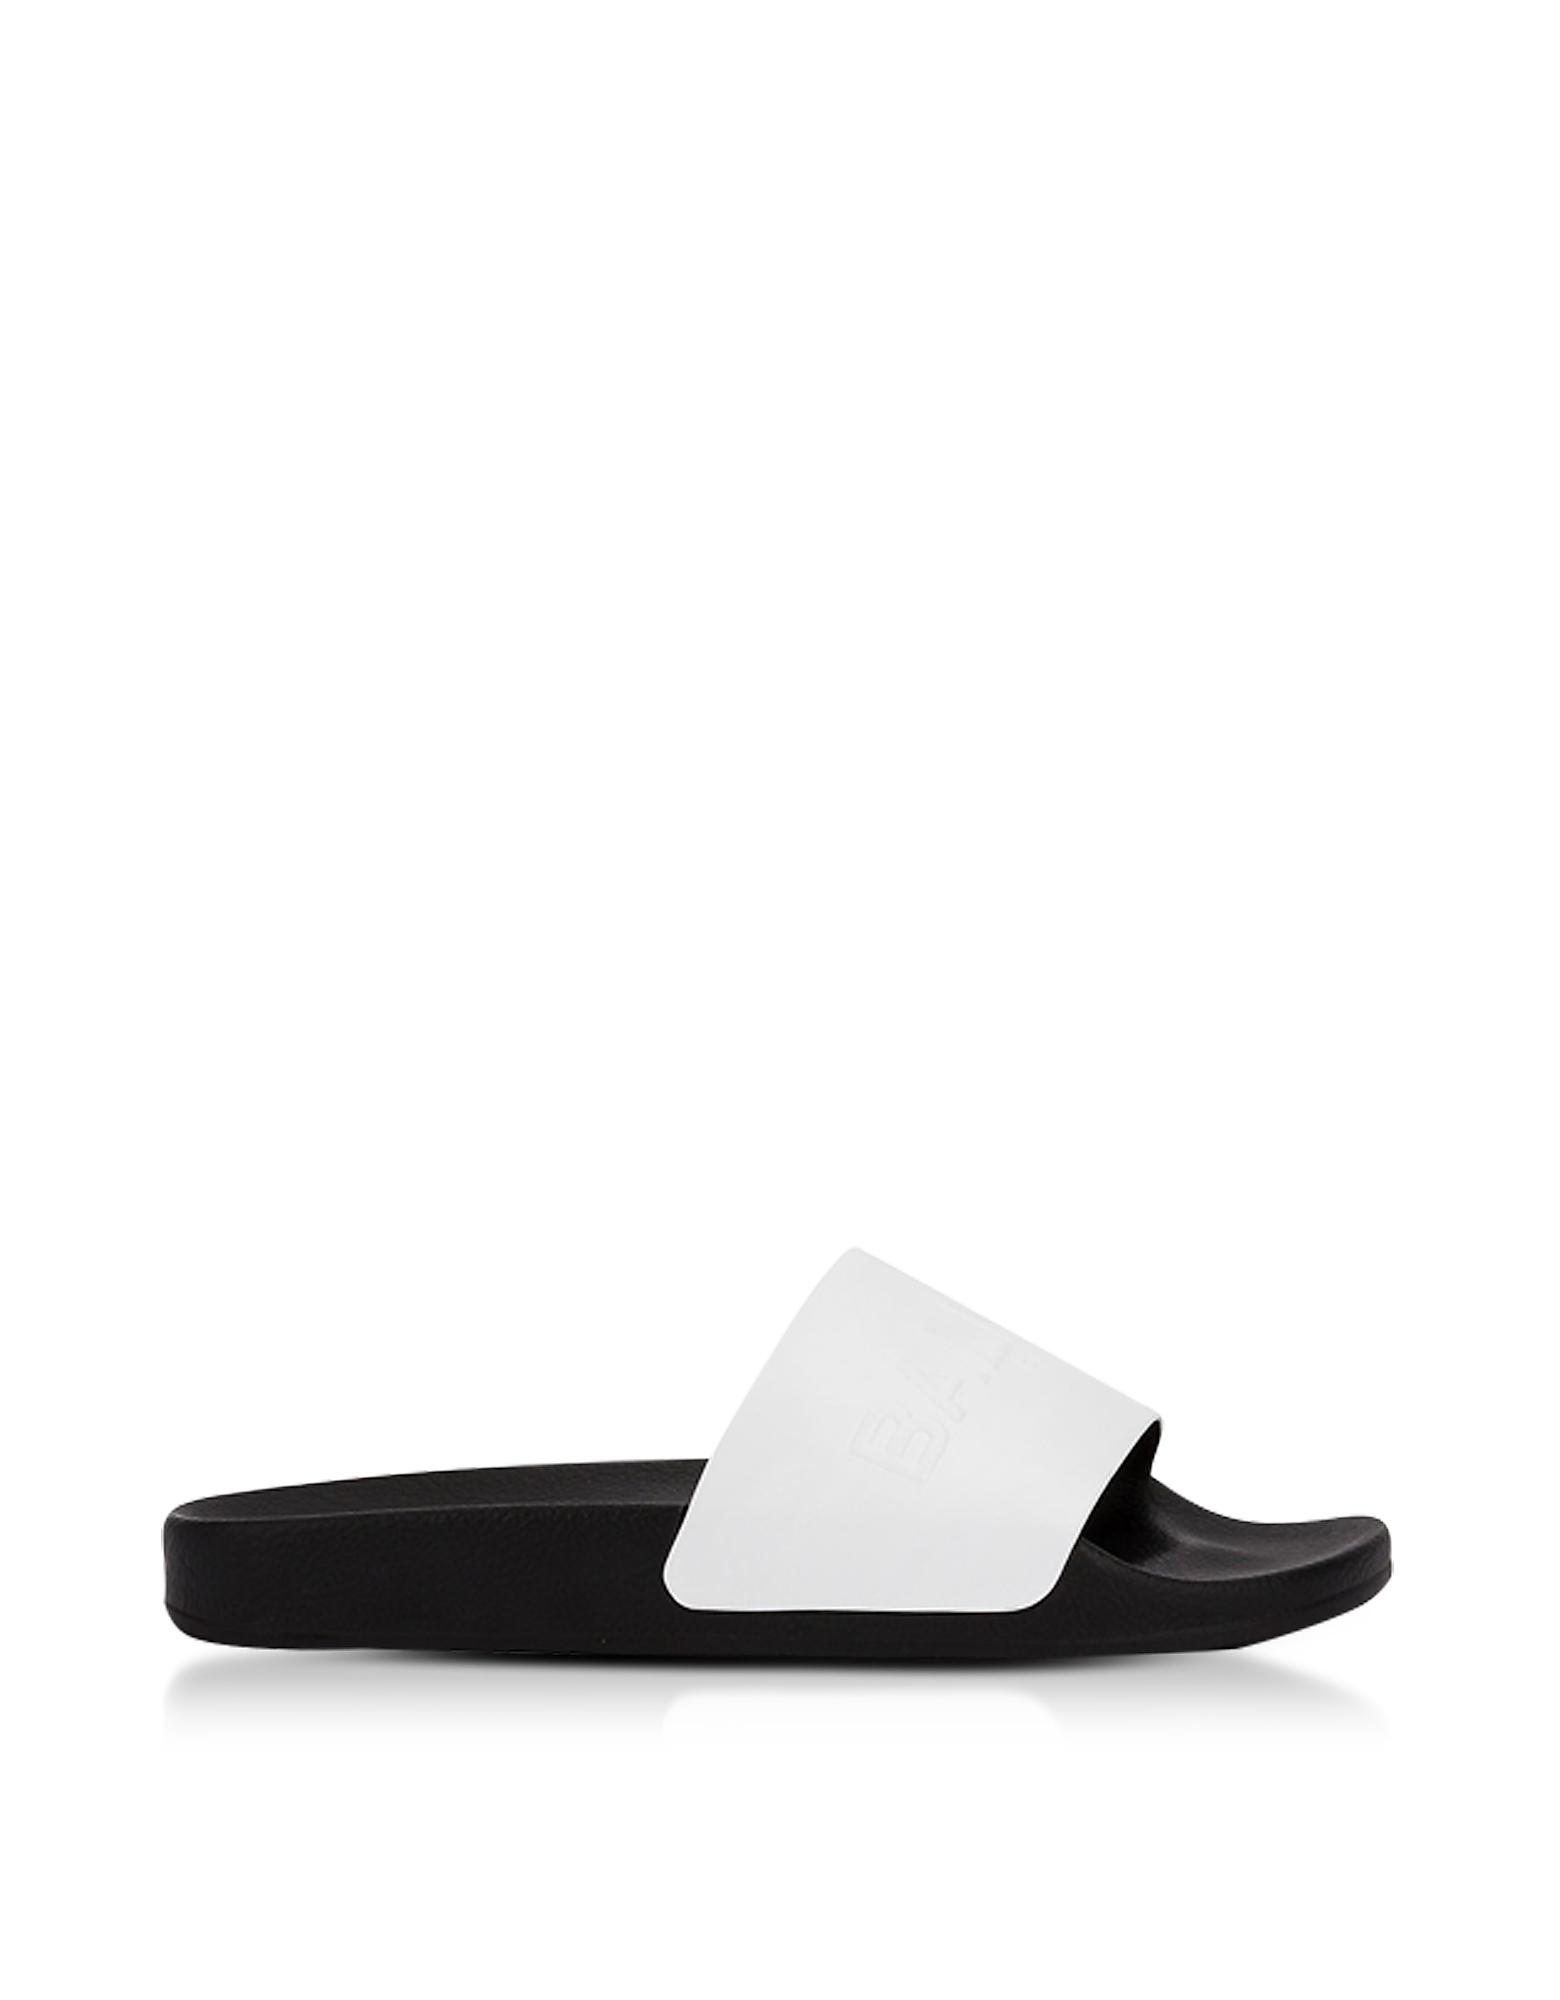 Balmain Shoes, White Leather Calypso Men's Slide Sandals